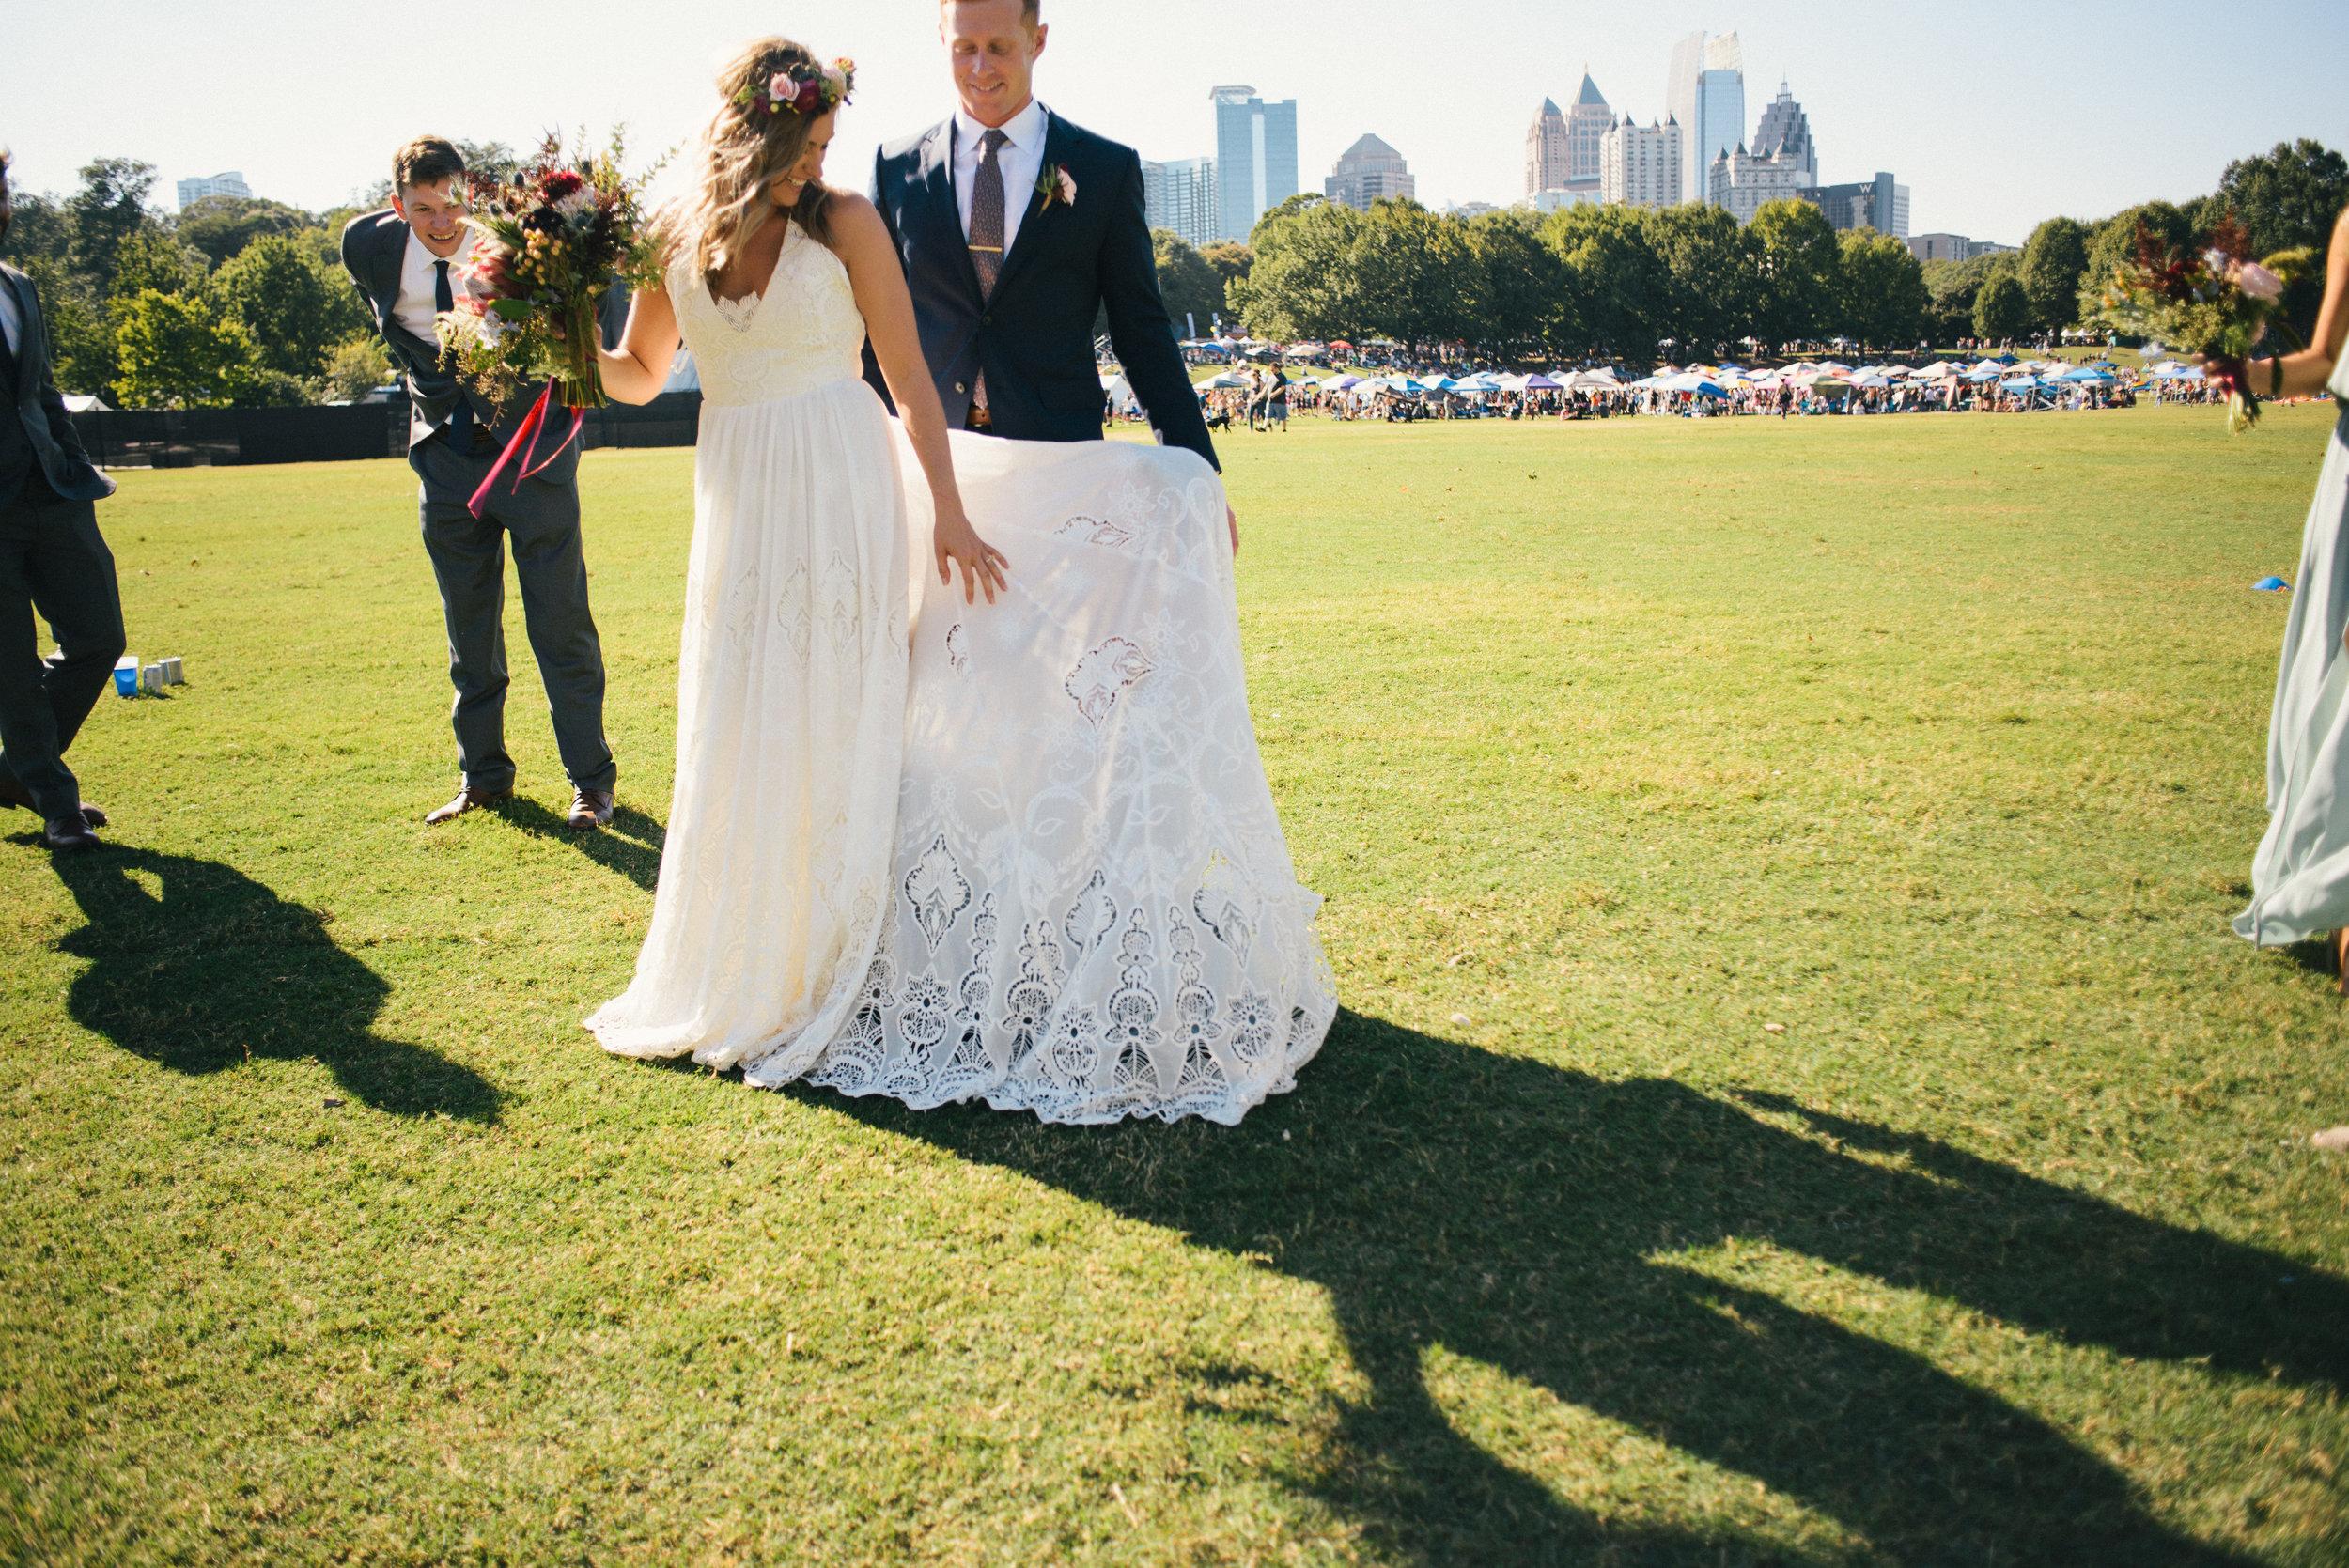 kristin-and-peter-atlanta-georgia-wedding-october-8th-2016 (197 of 1068).jpg